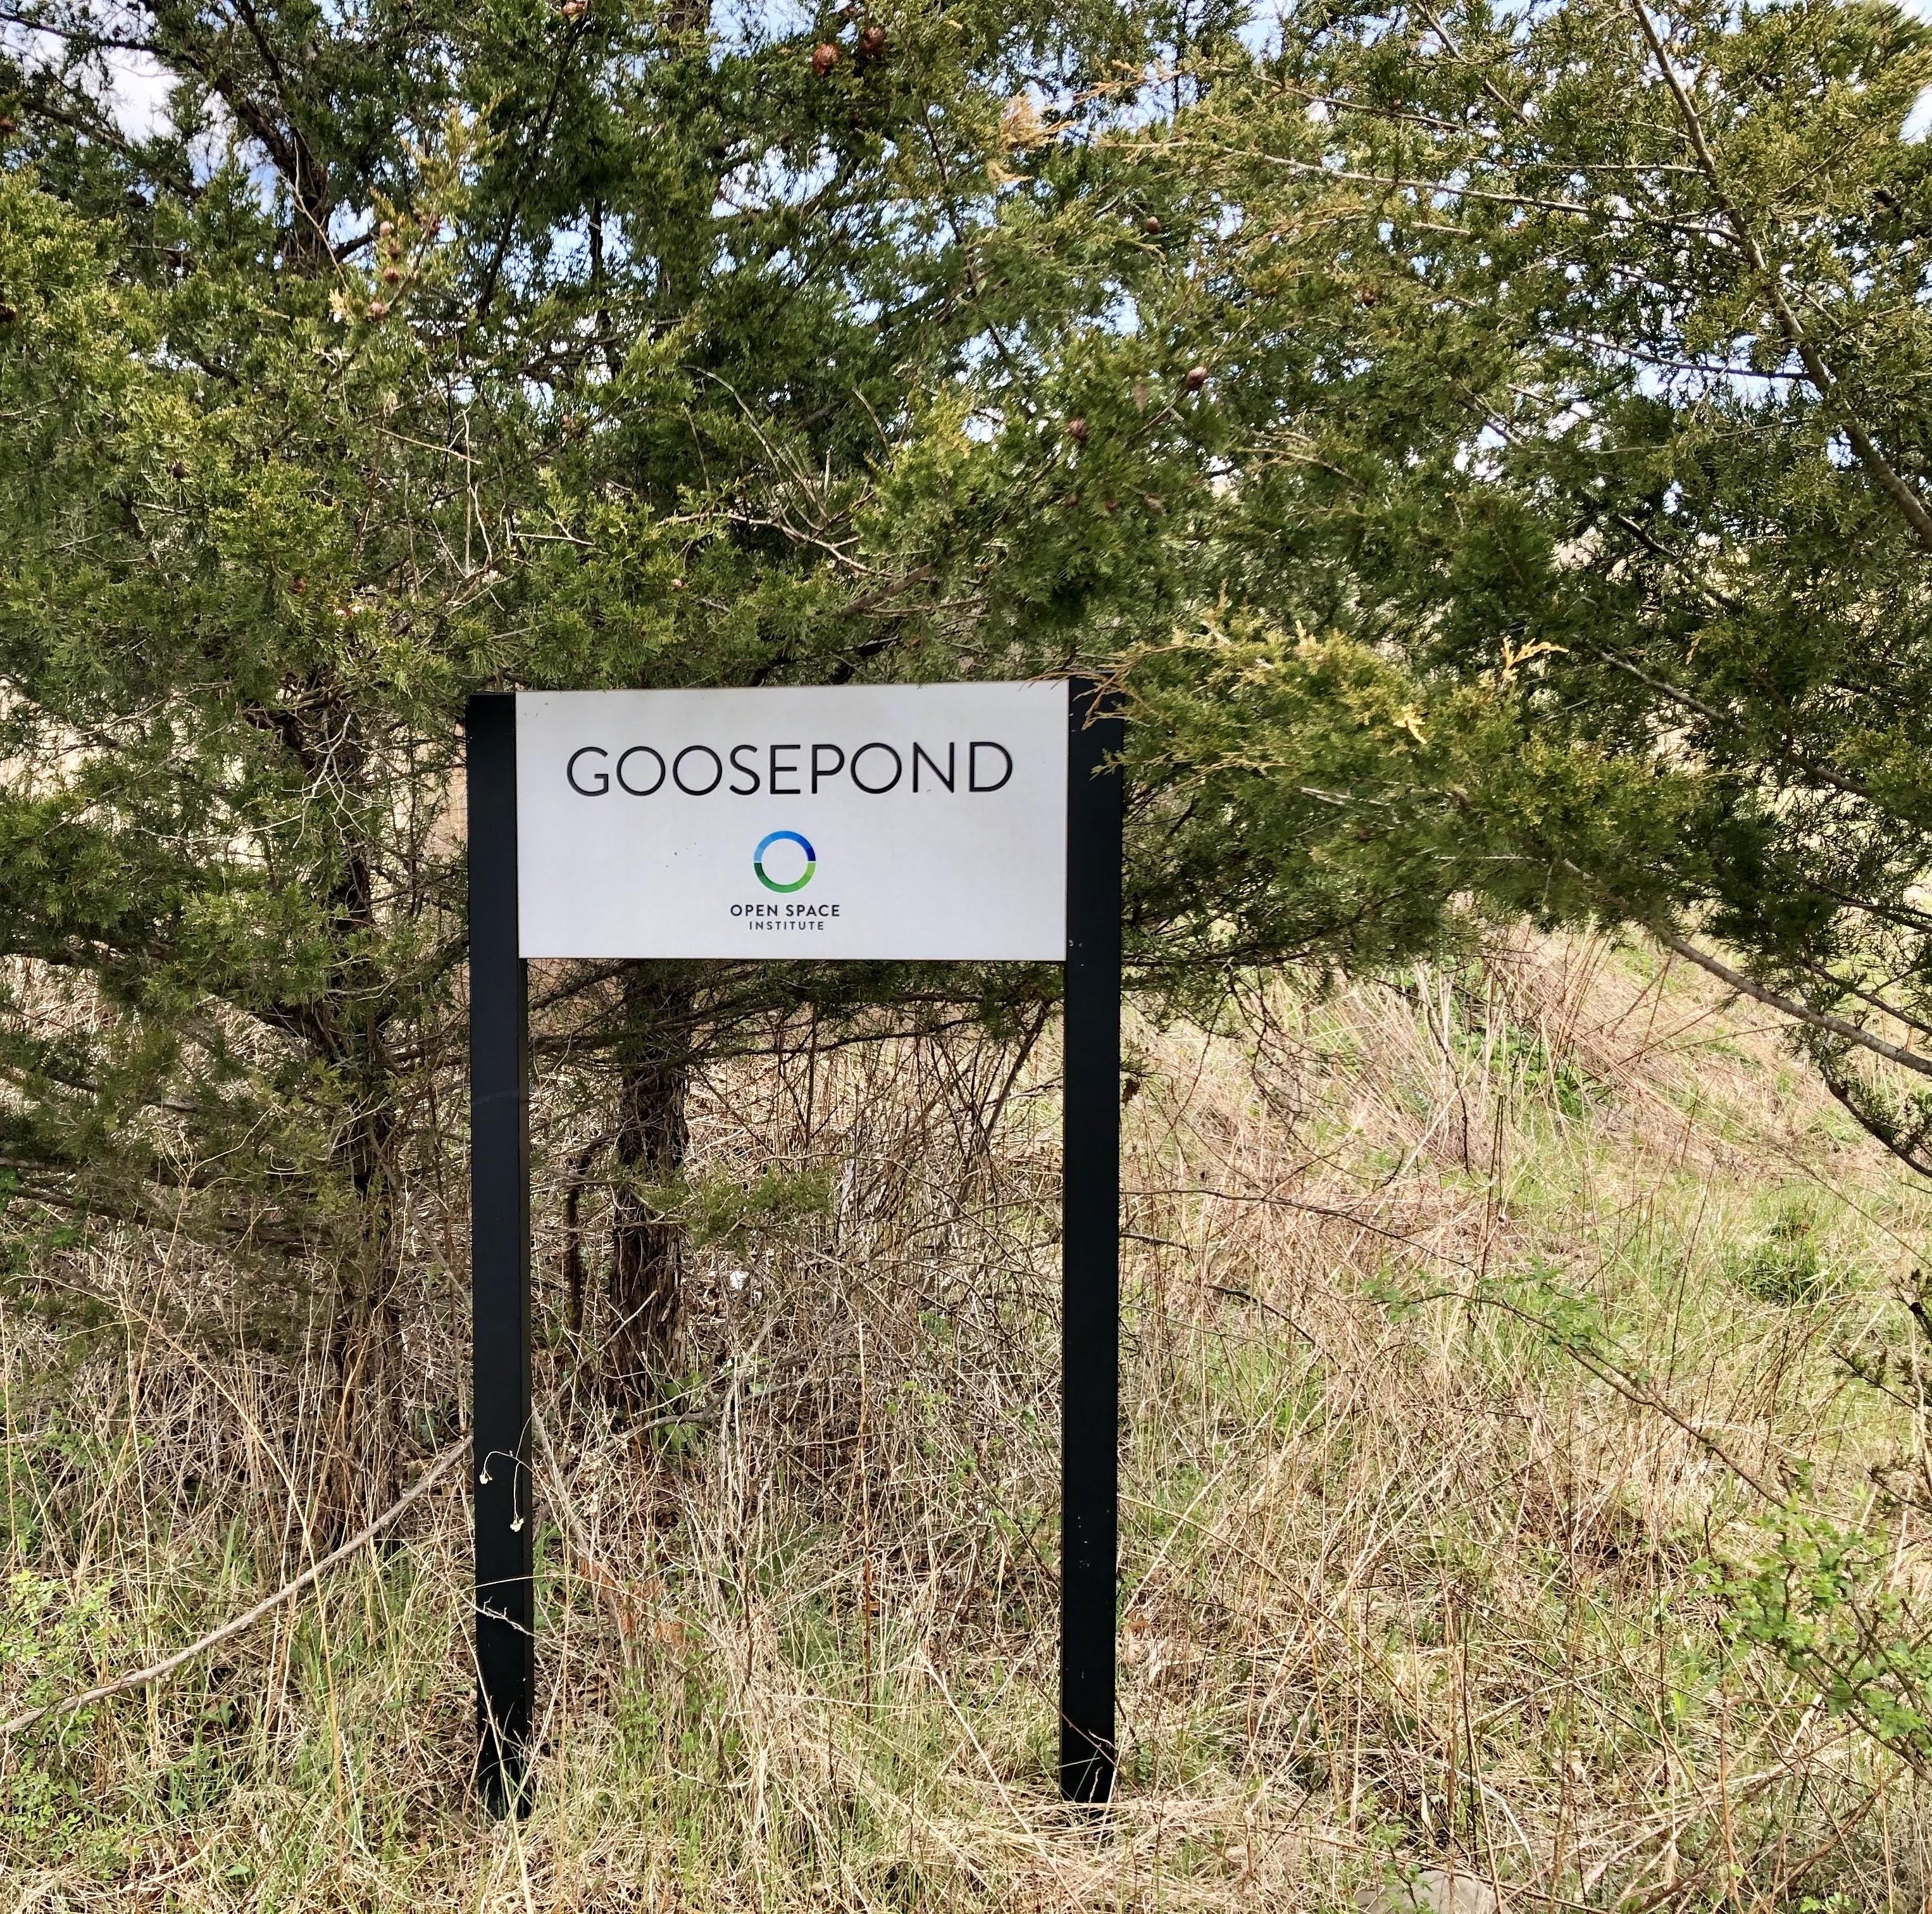 Goosepond sign at parking area